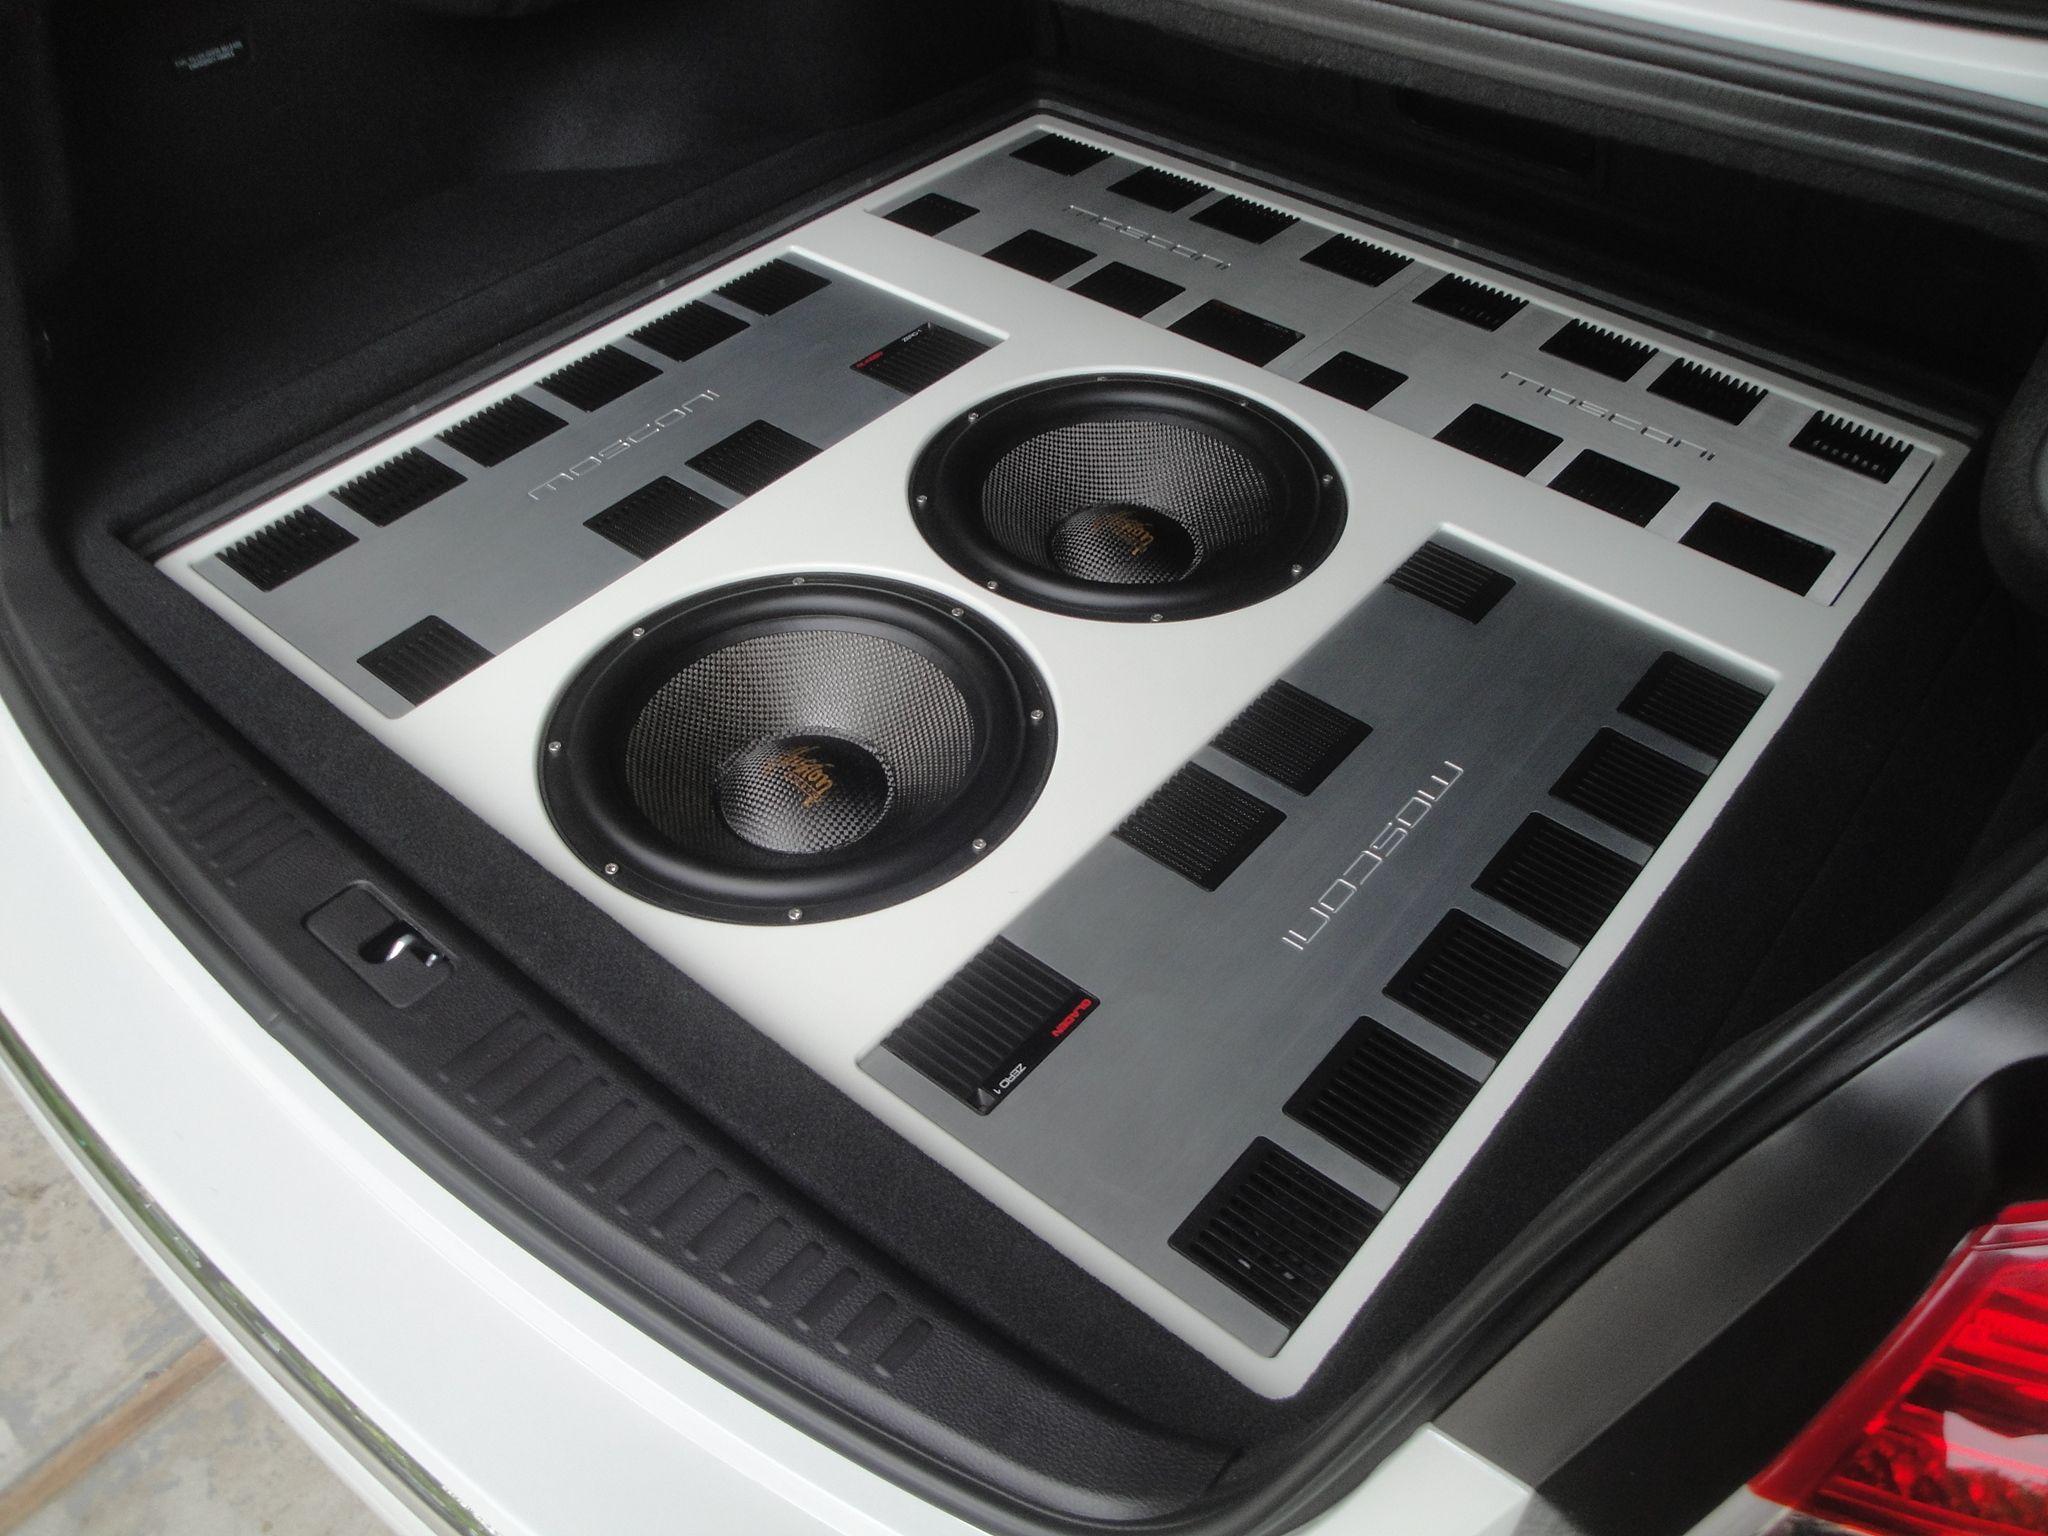 My Ultimate Fake Floor Build Mosconi Focal Illusion 2012 Genesis Sedan 600 Pics Diyma Car Audio Forum Custom Car Audio Car Audio Installation Car Audio